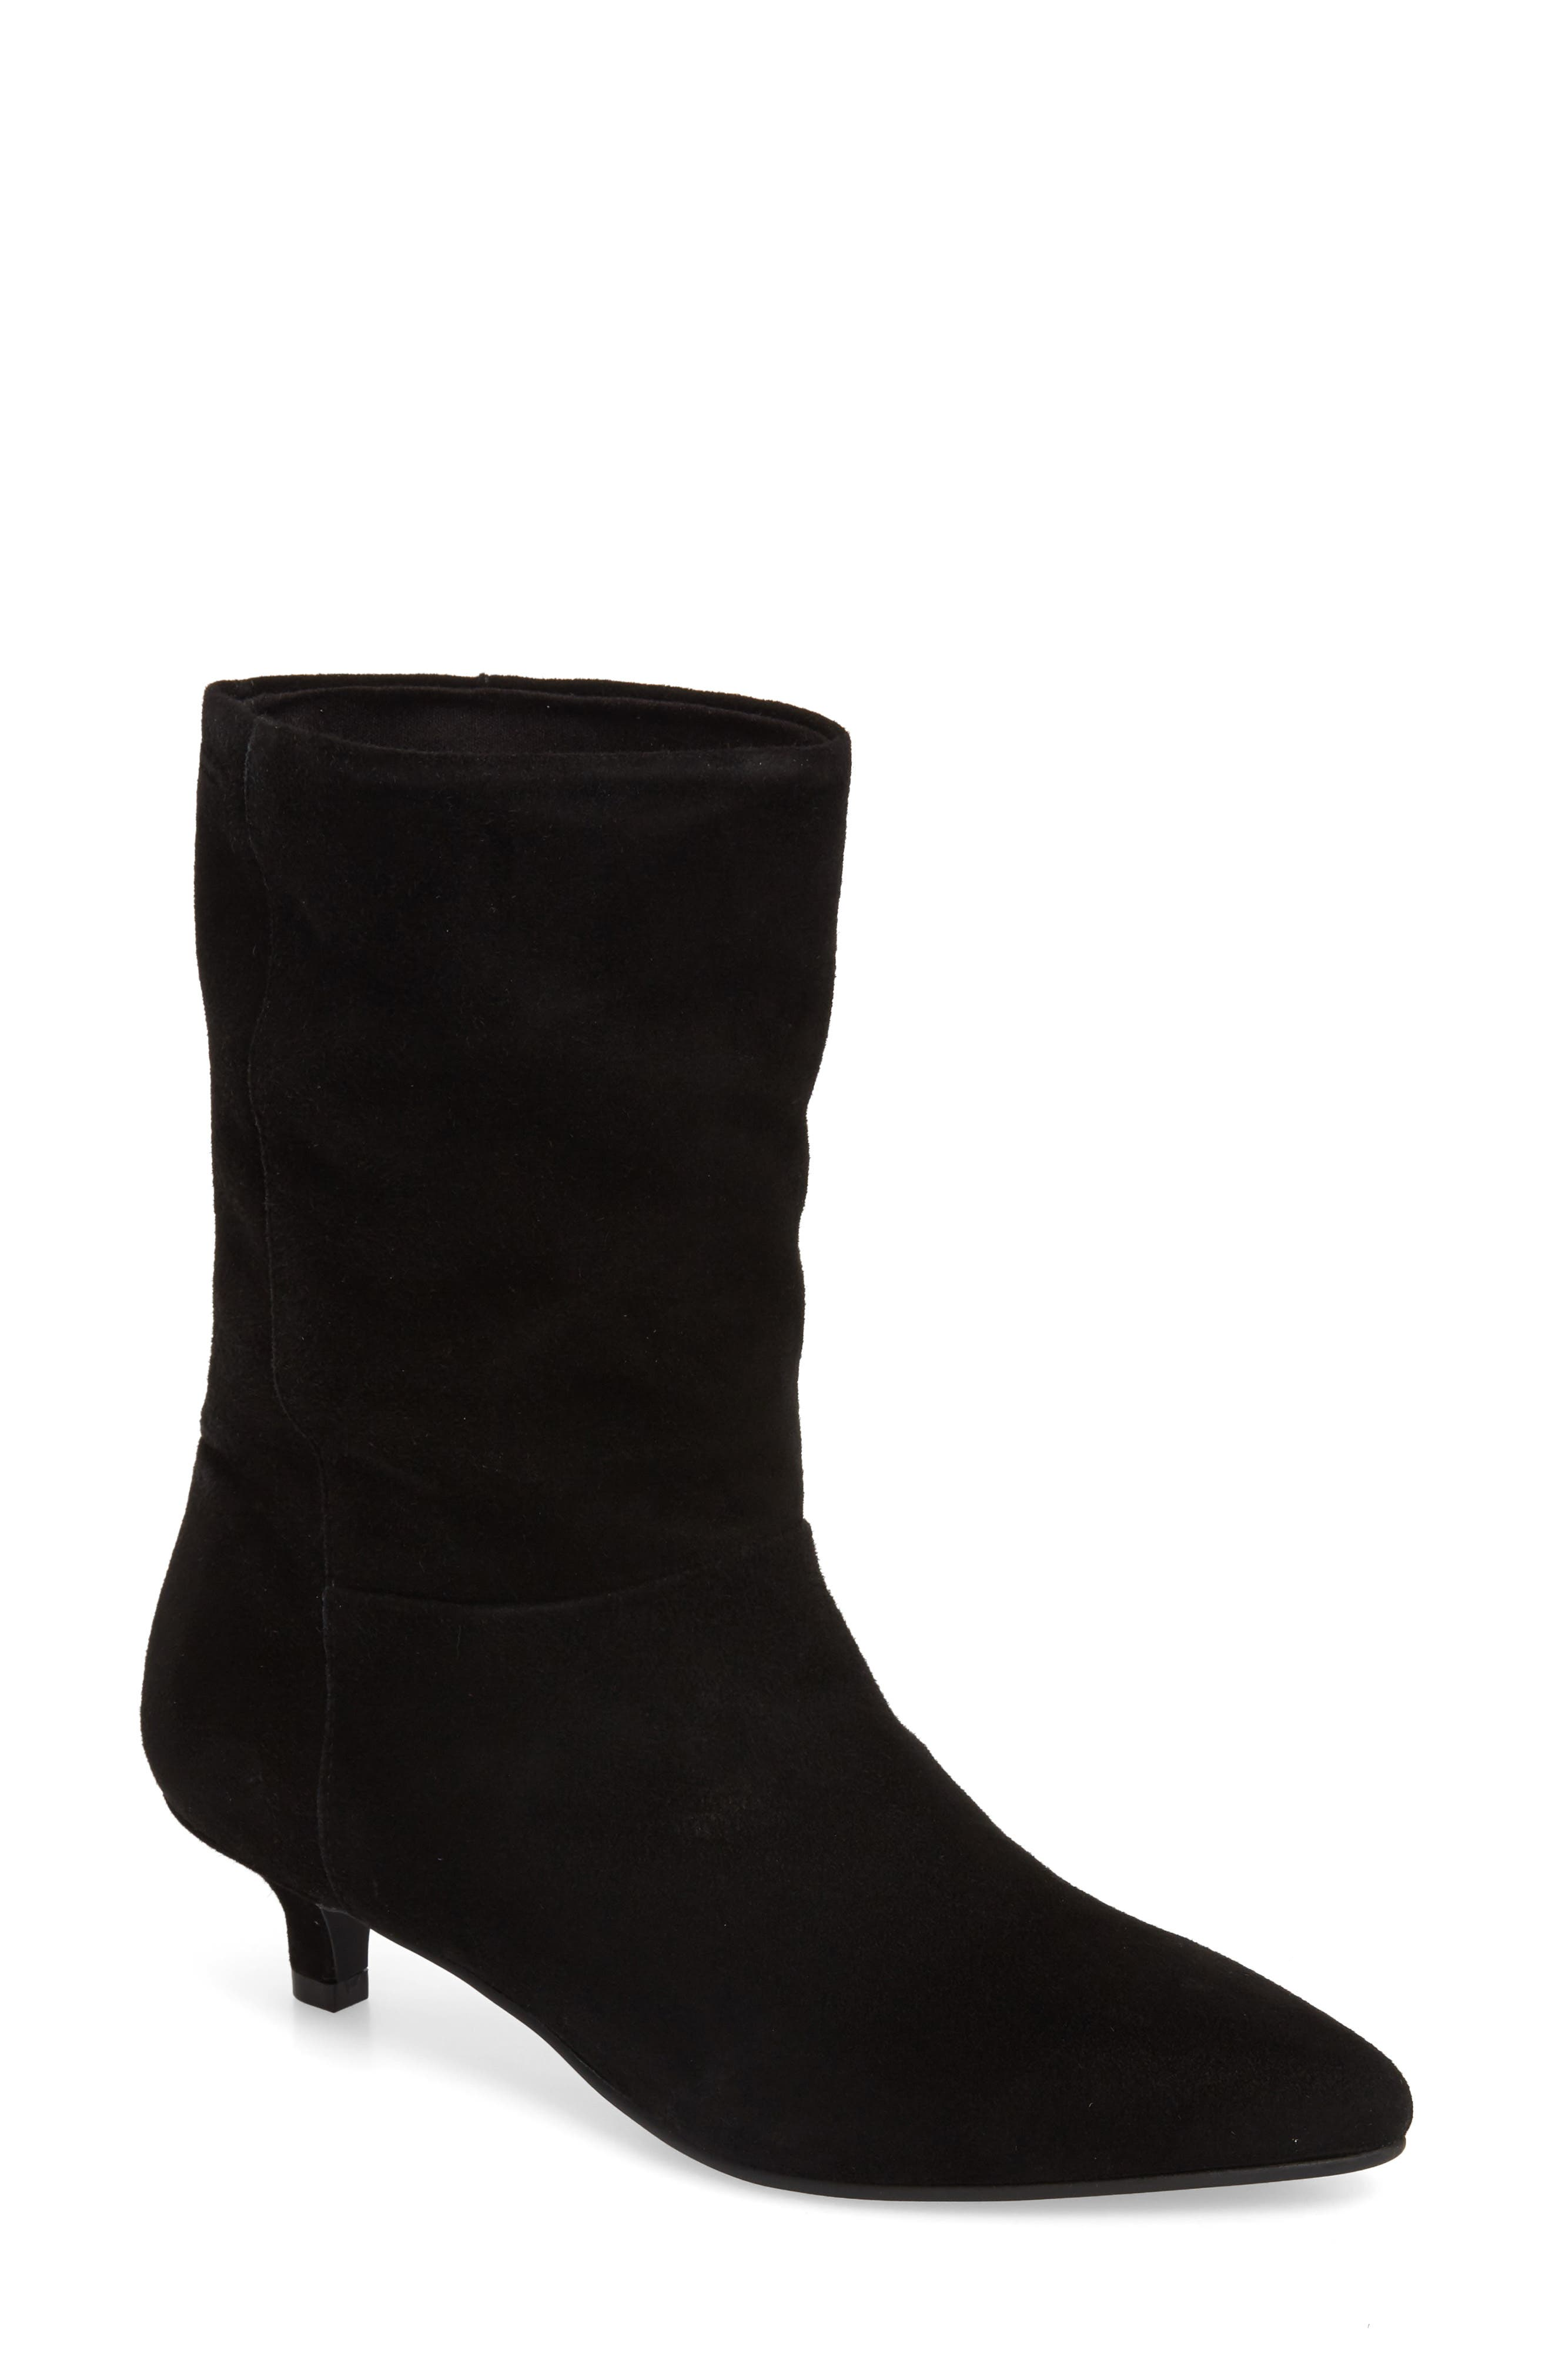 Vagabond Shoemakers Minna Slouch Bootie, Black